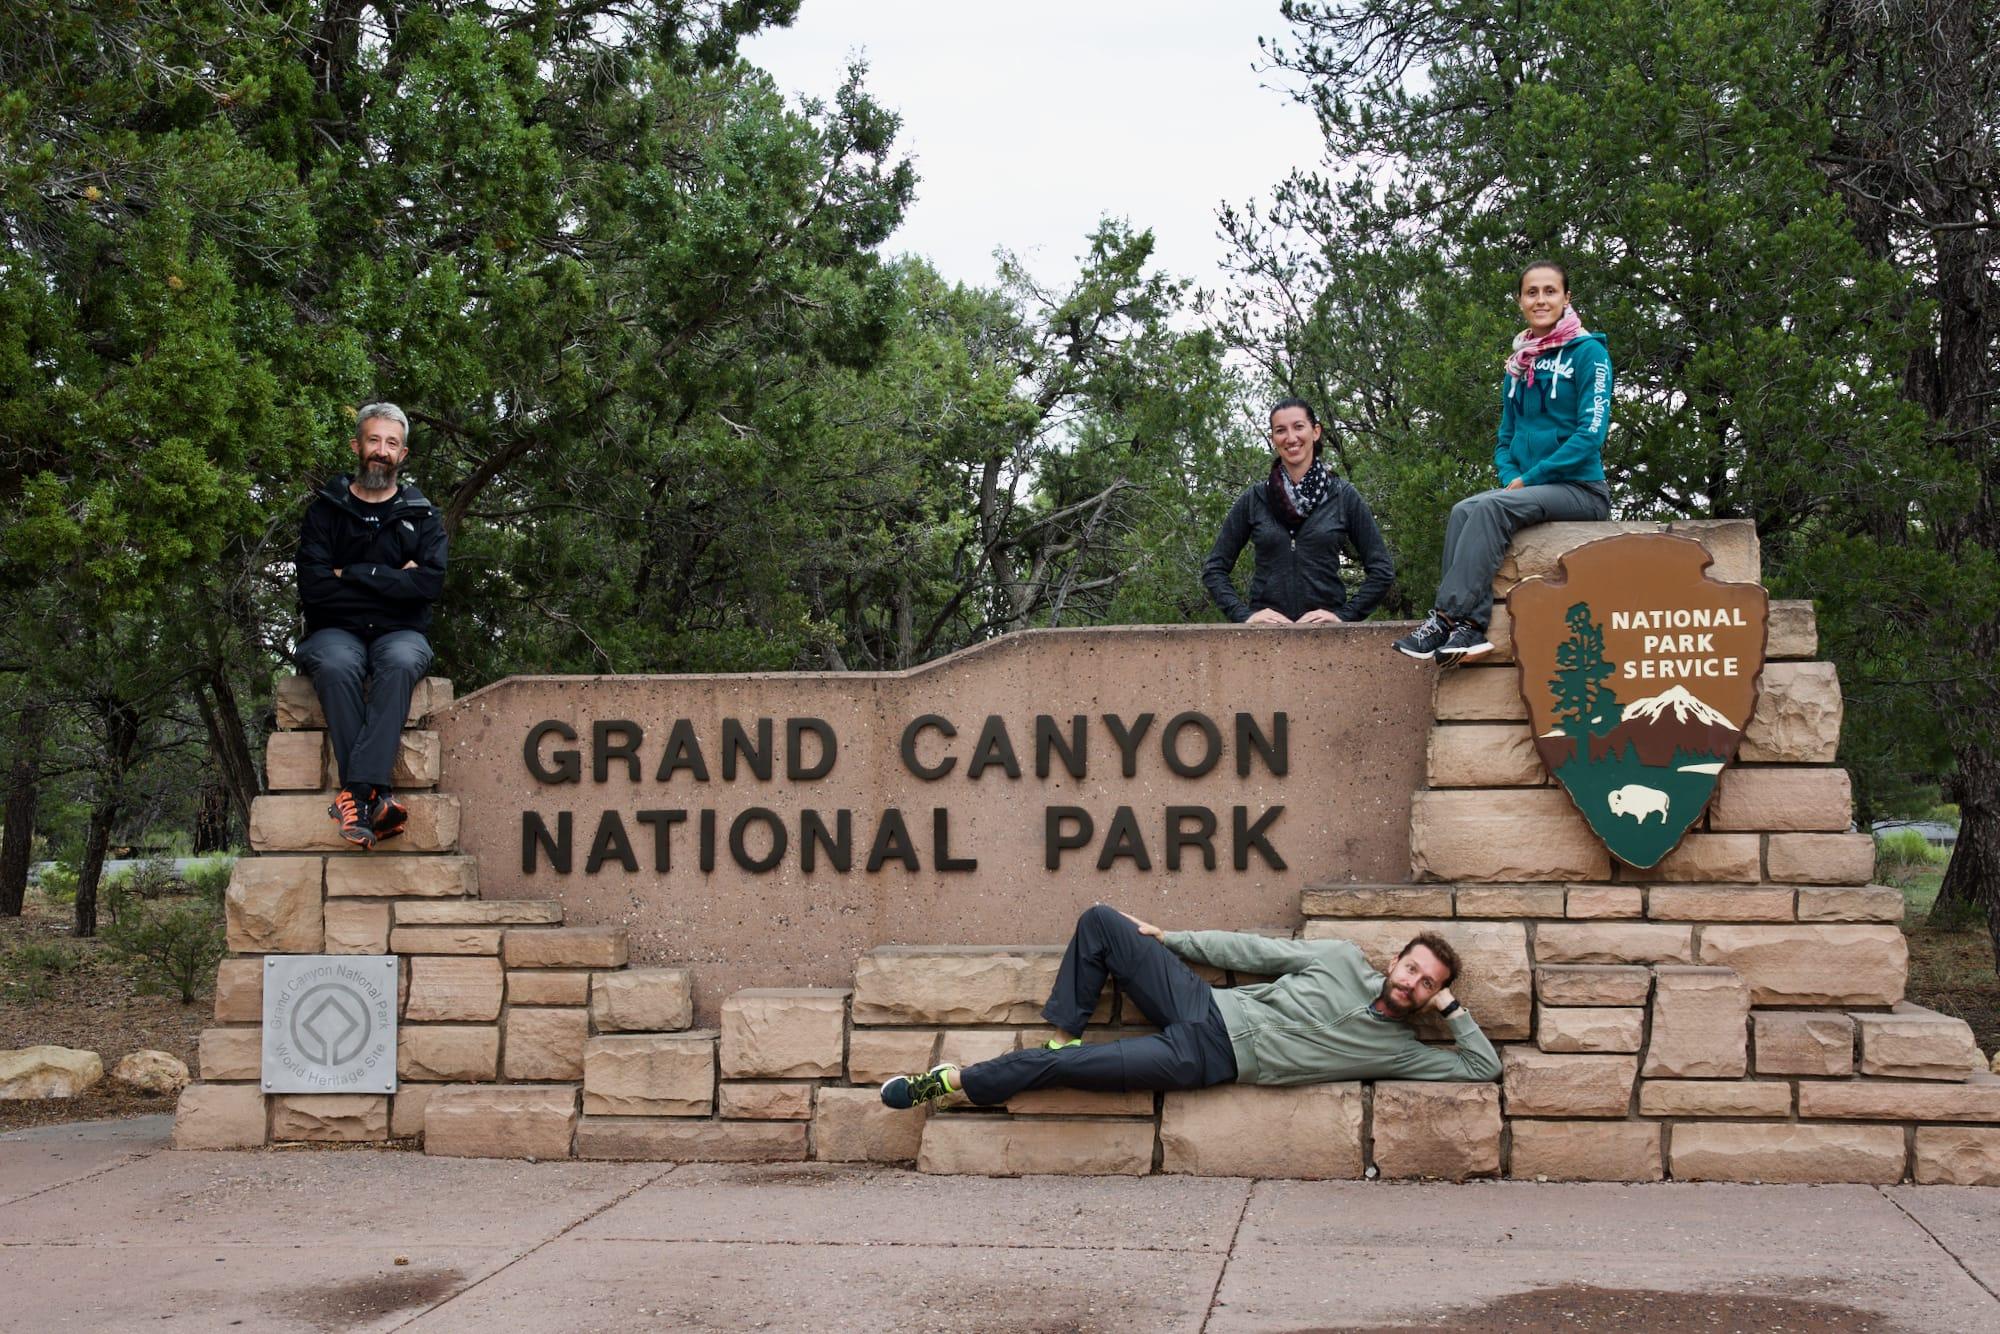 Ingresso al Grand Canyon